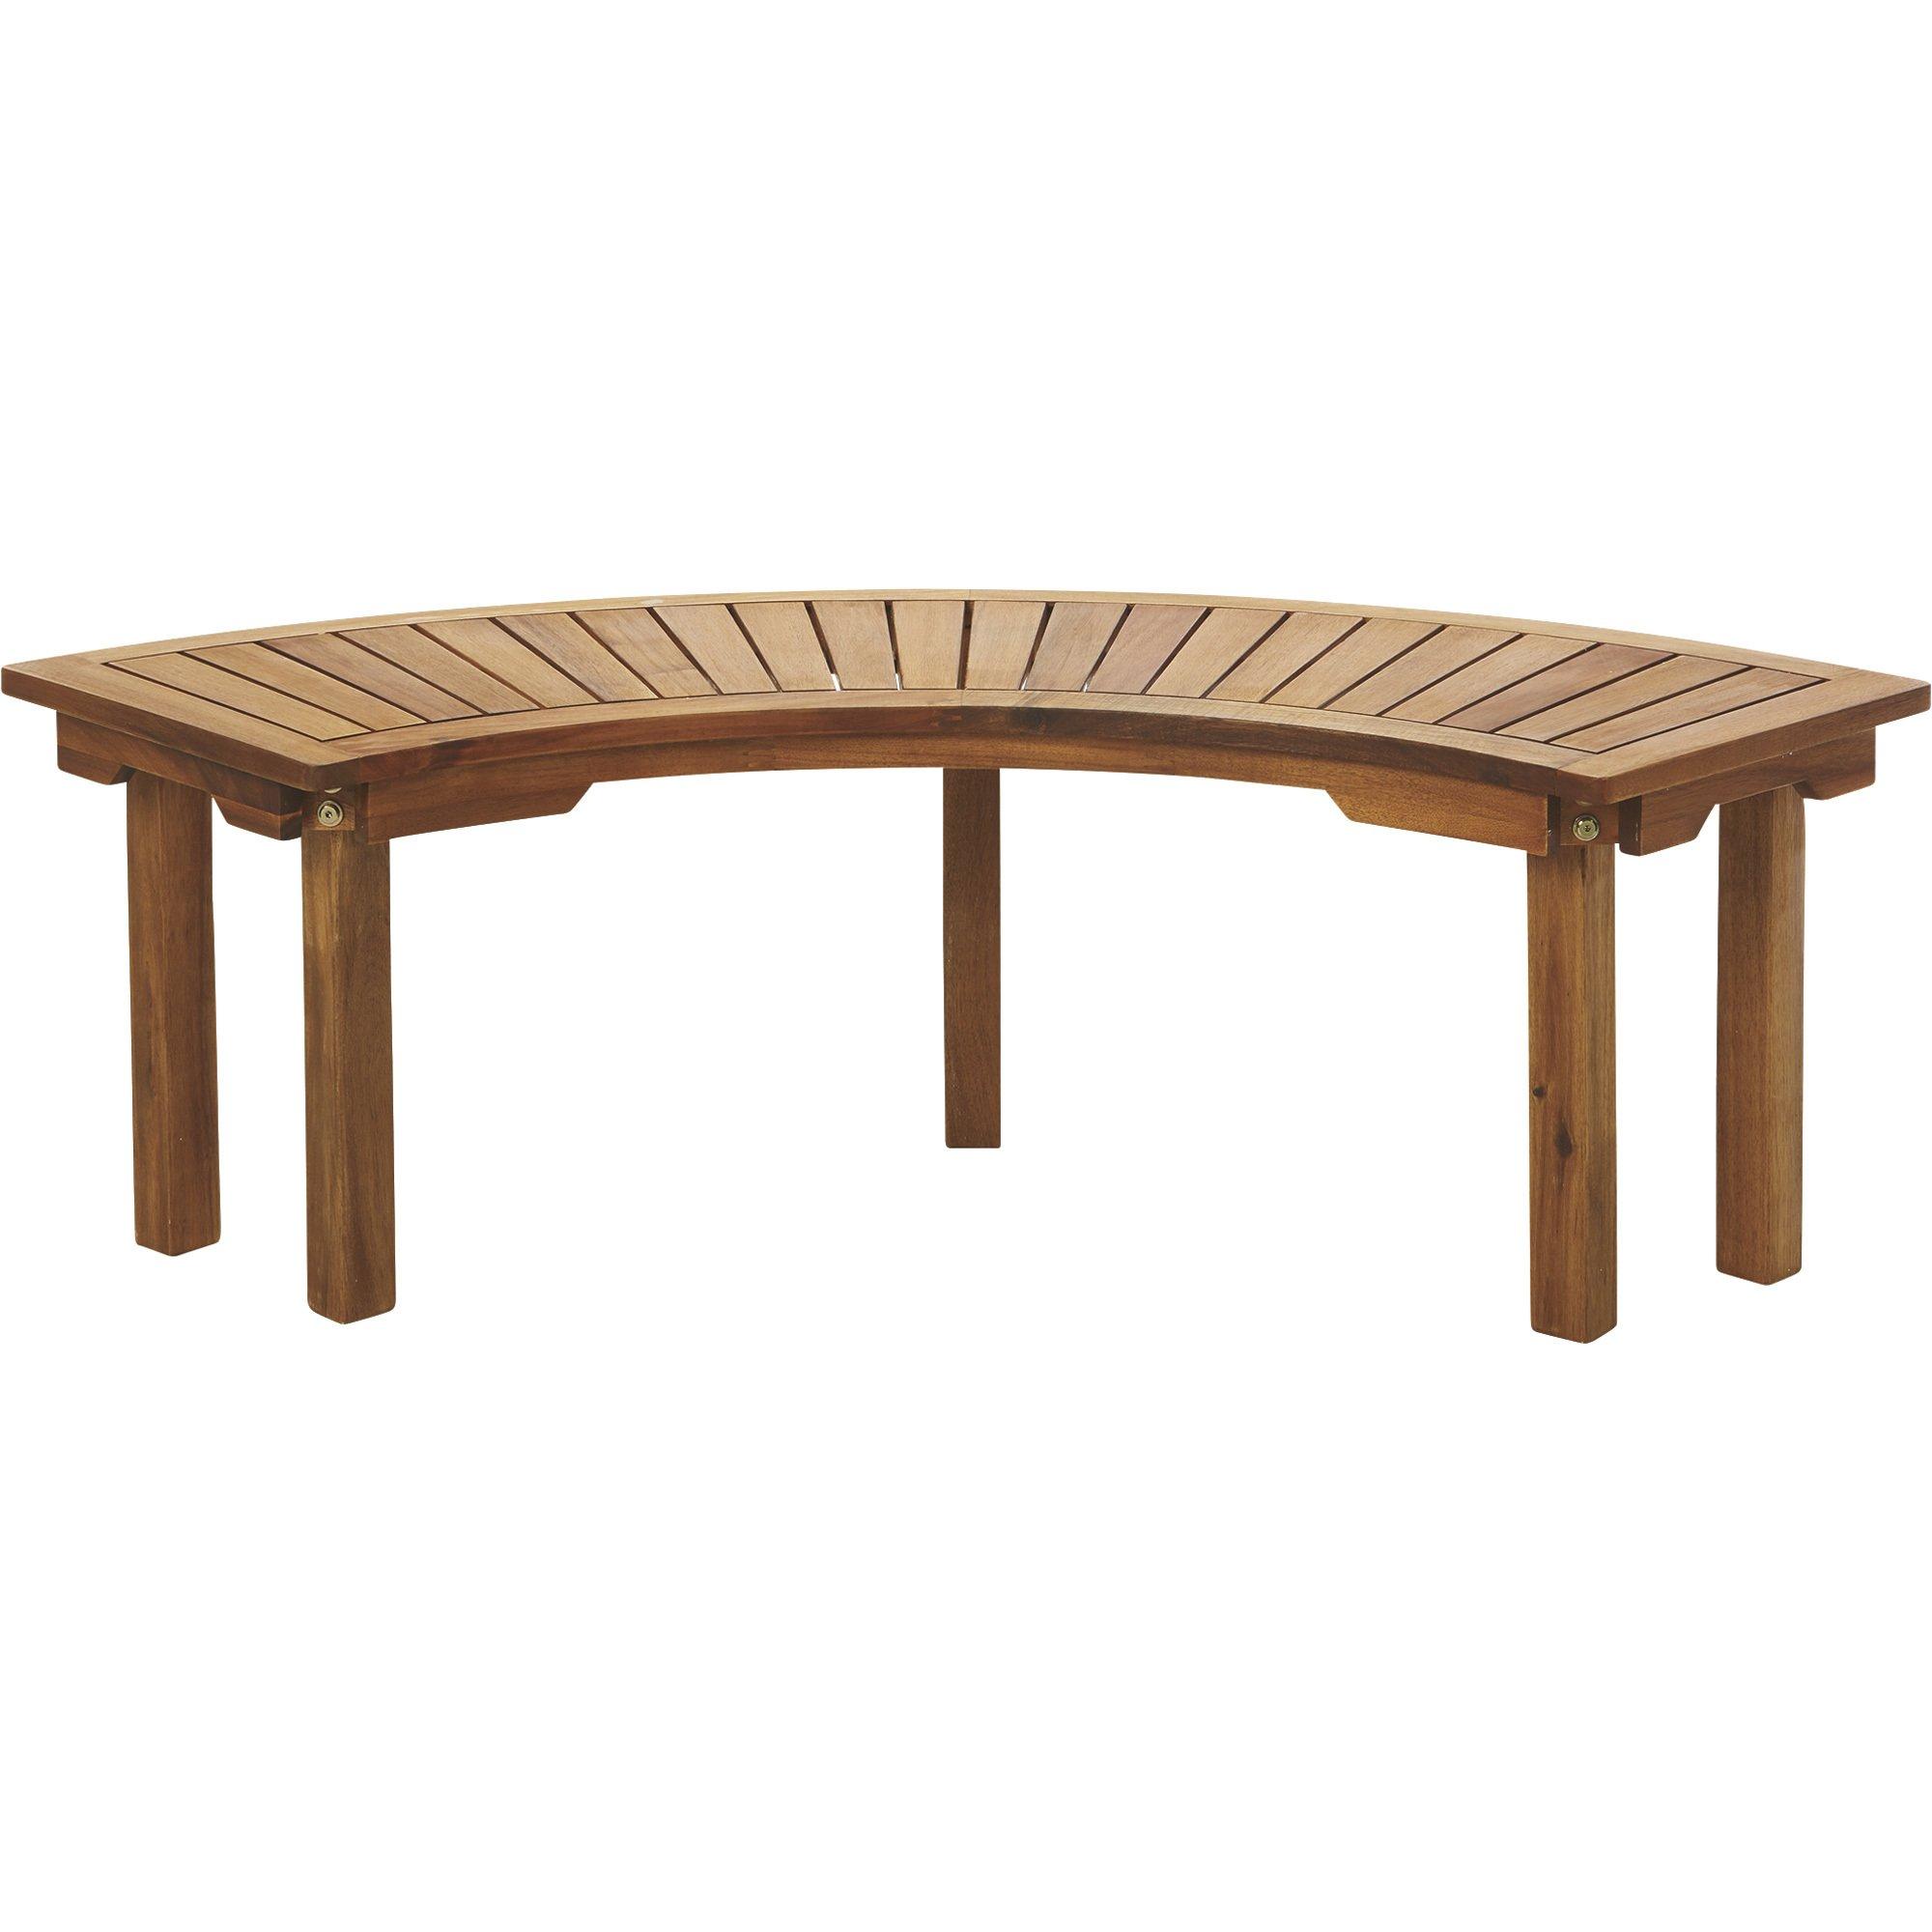 Curved Acacia Wood Backless Bench — Natural